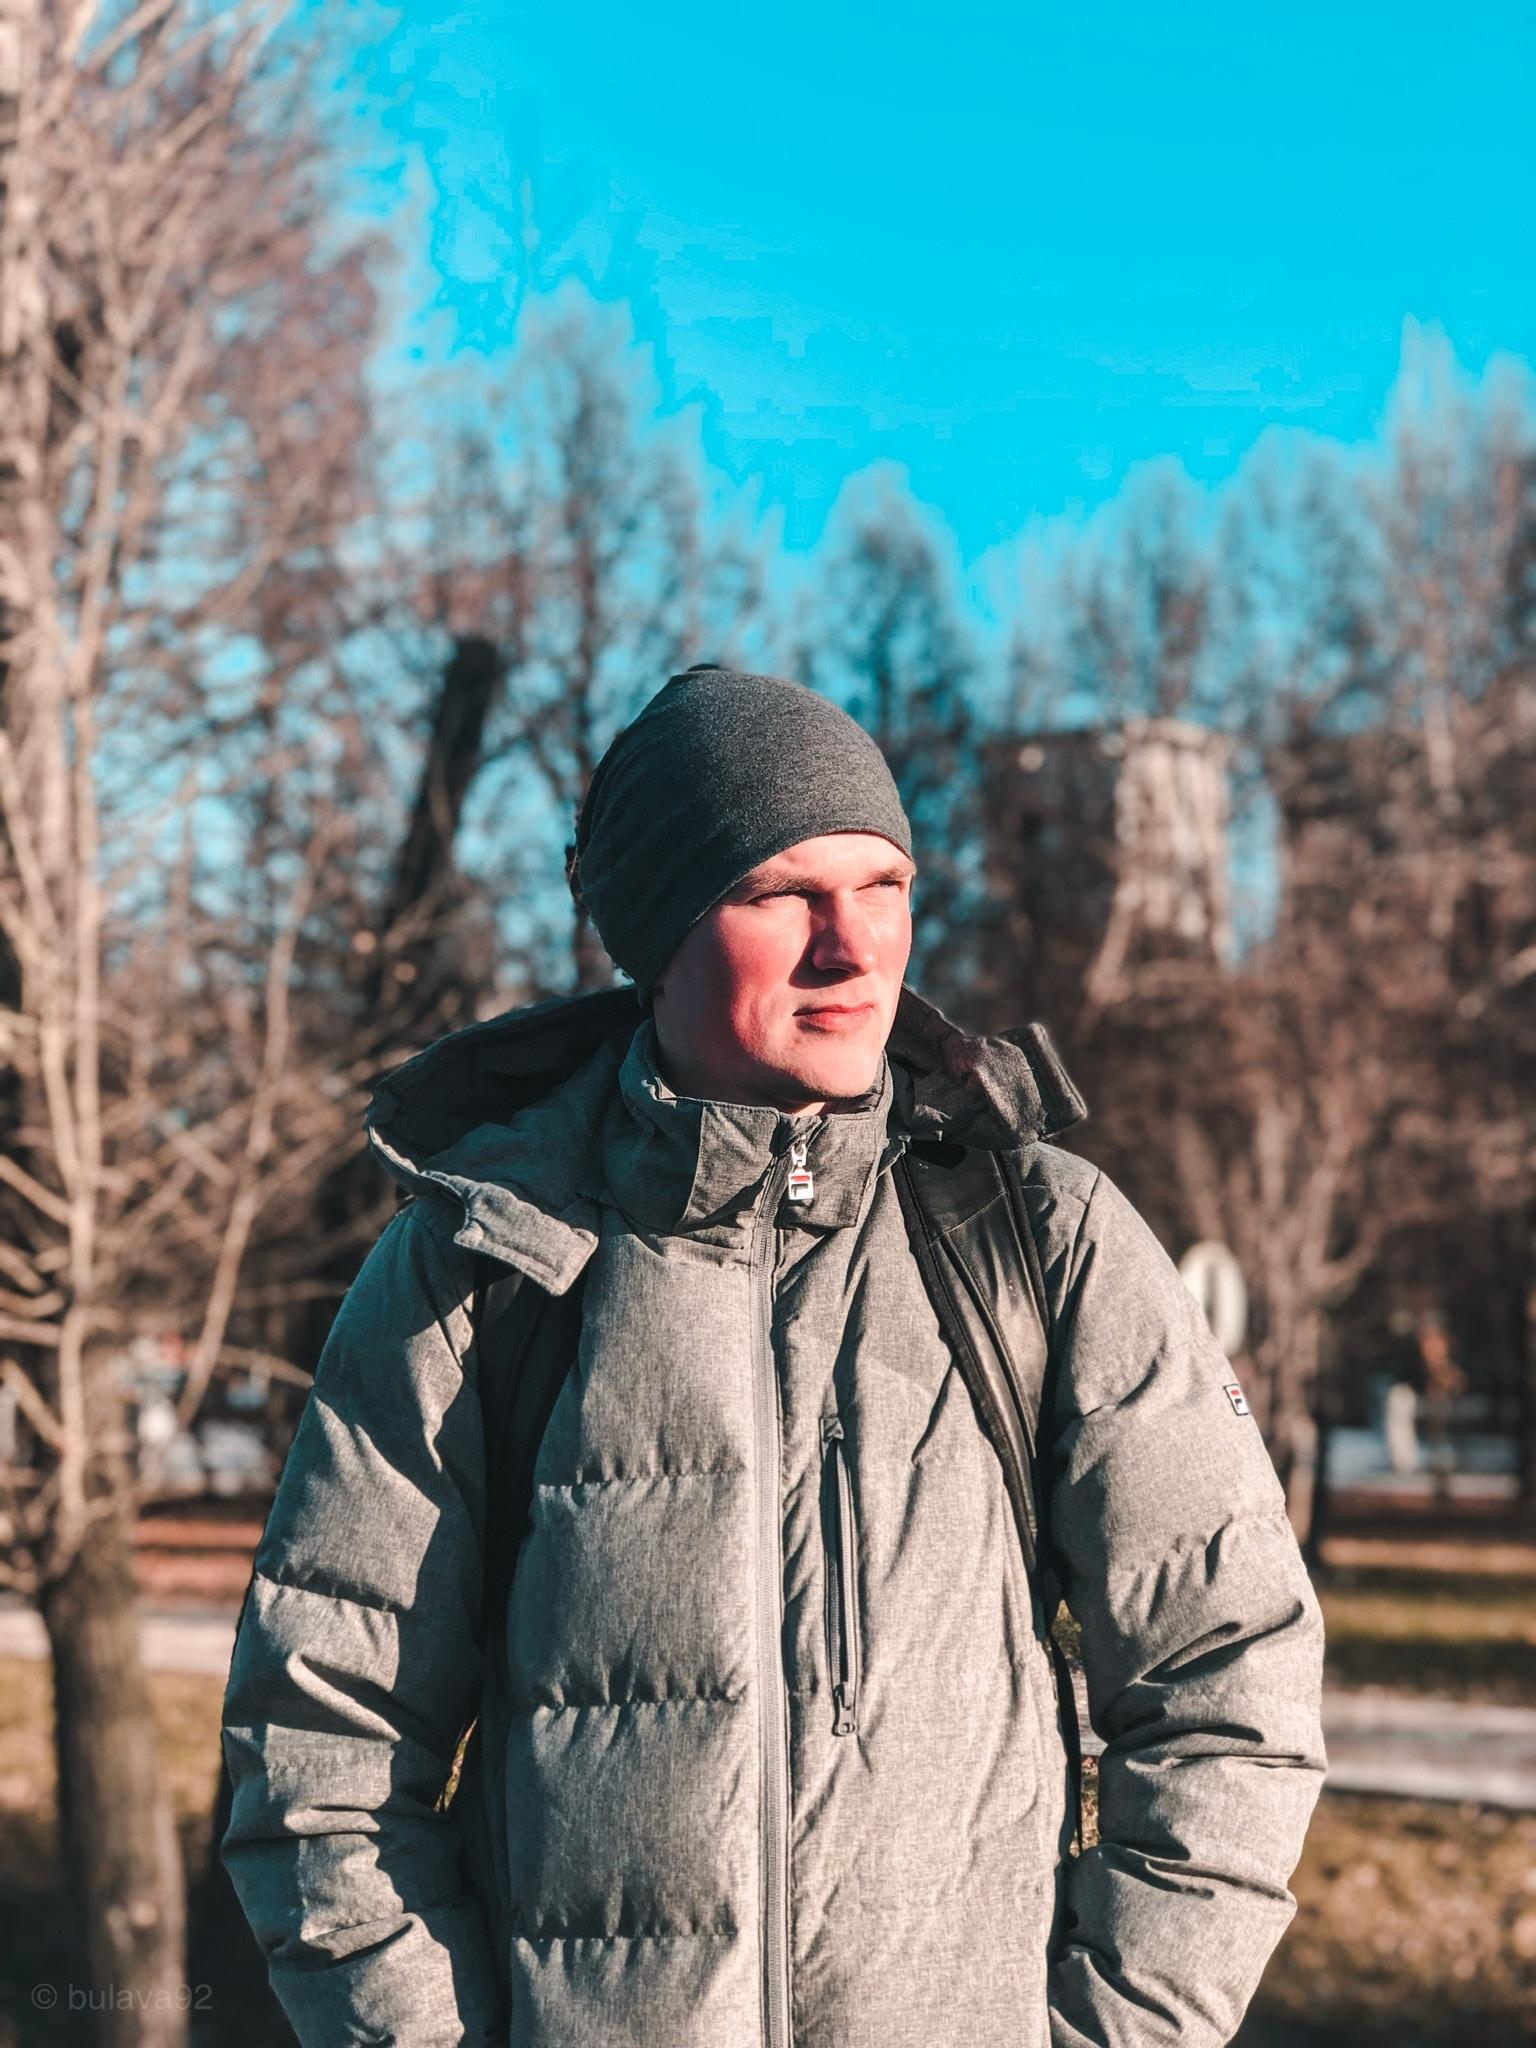 Go to Vladislav Bulatov's profile